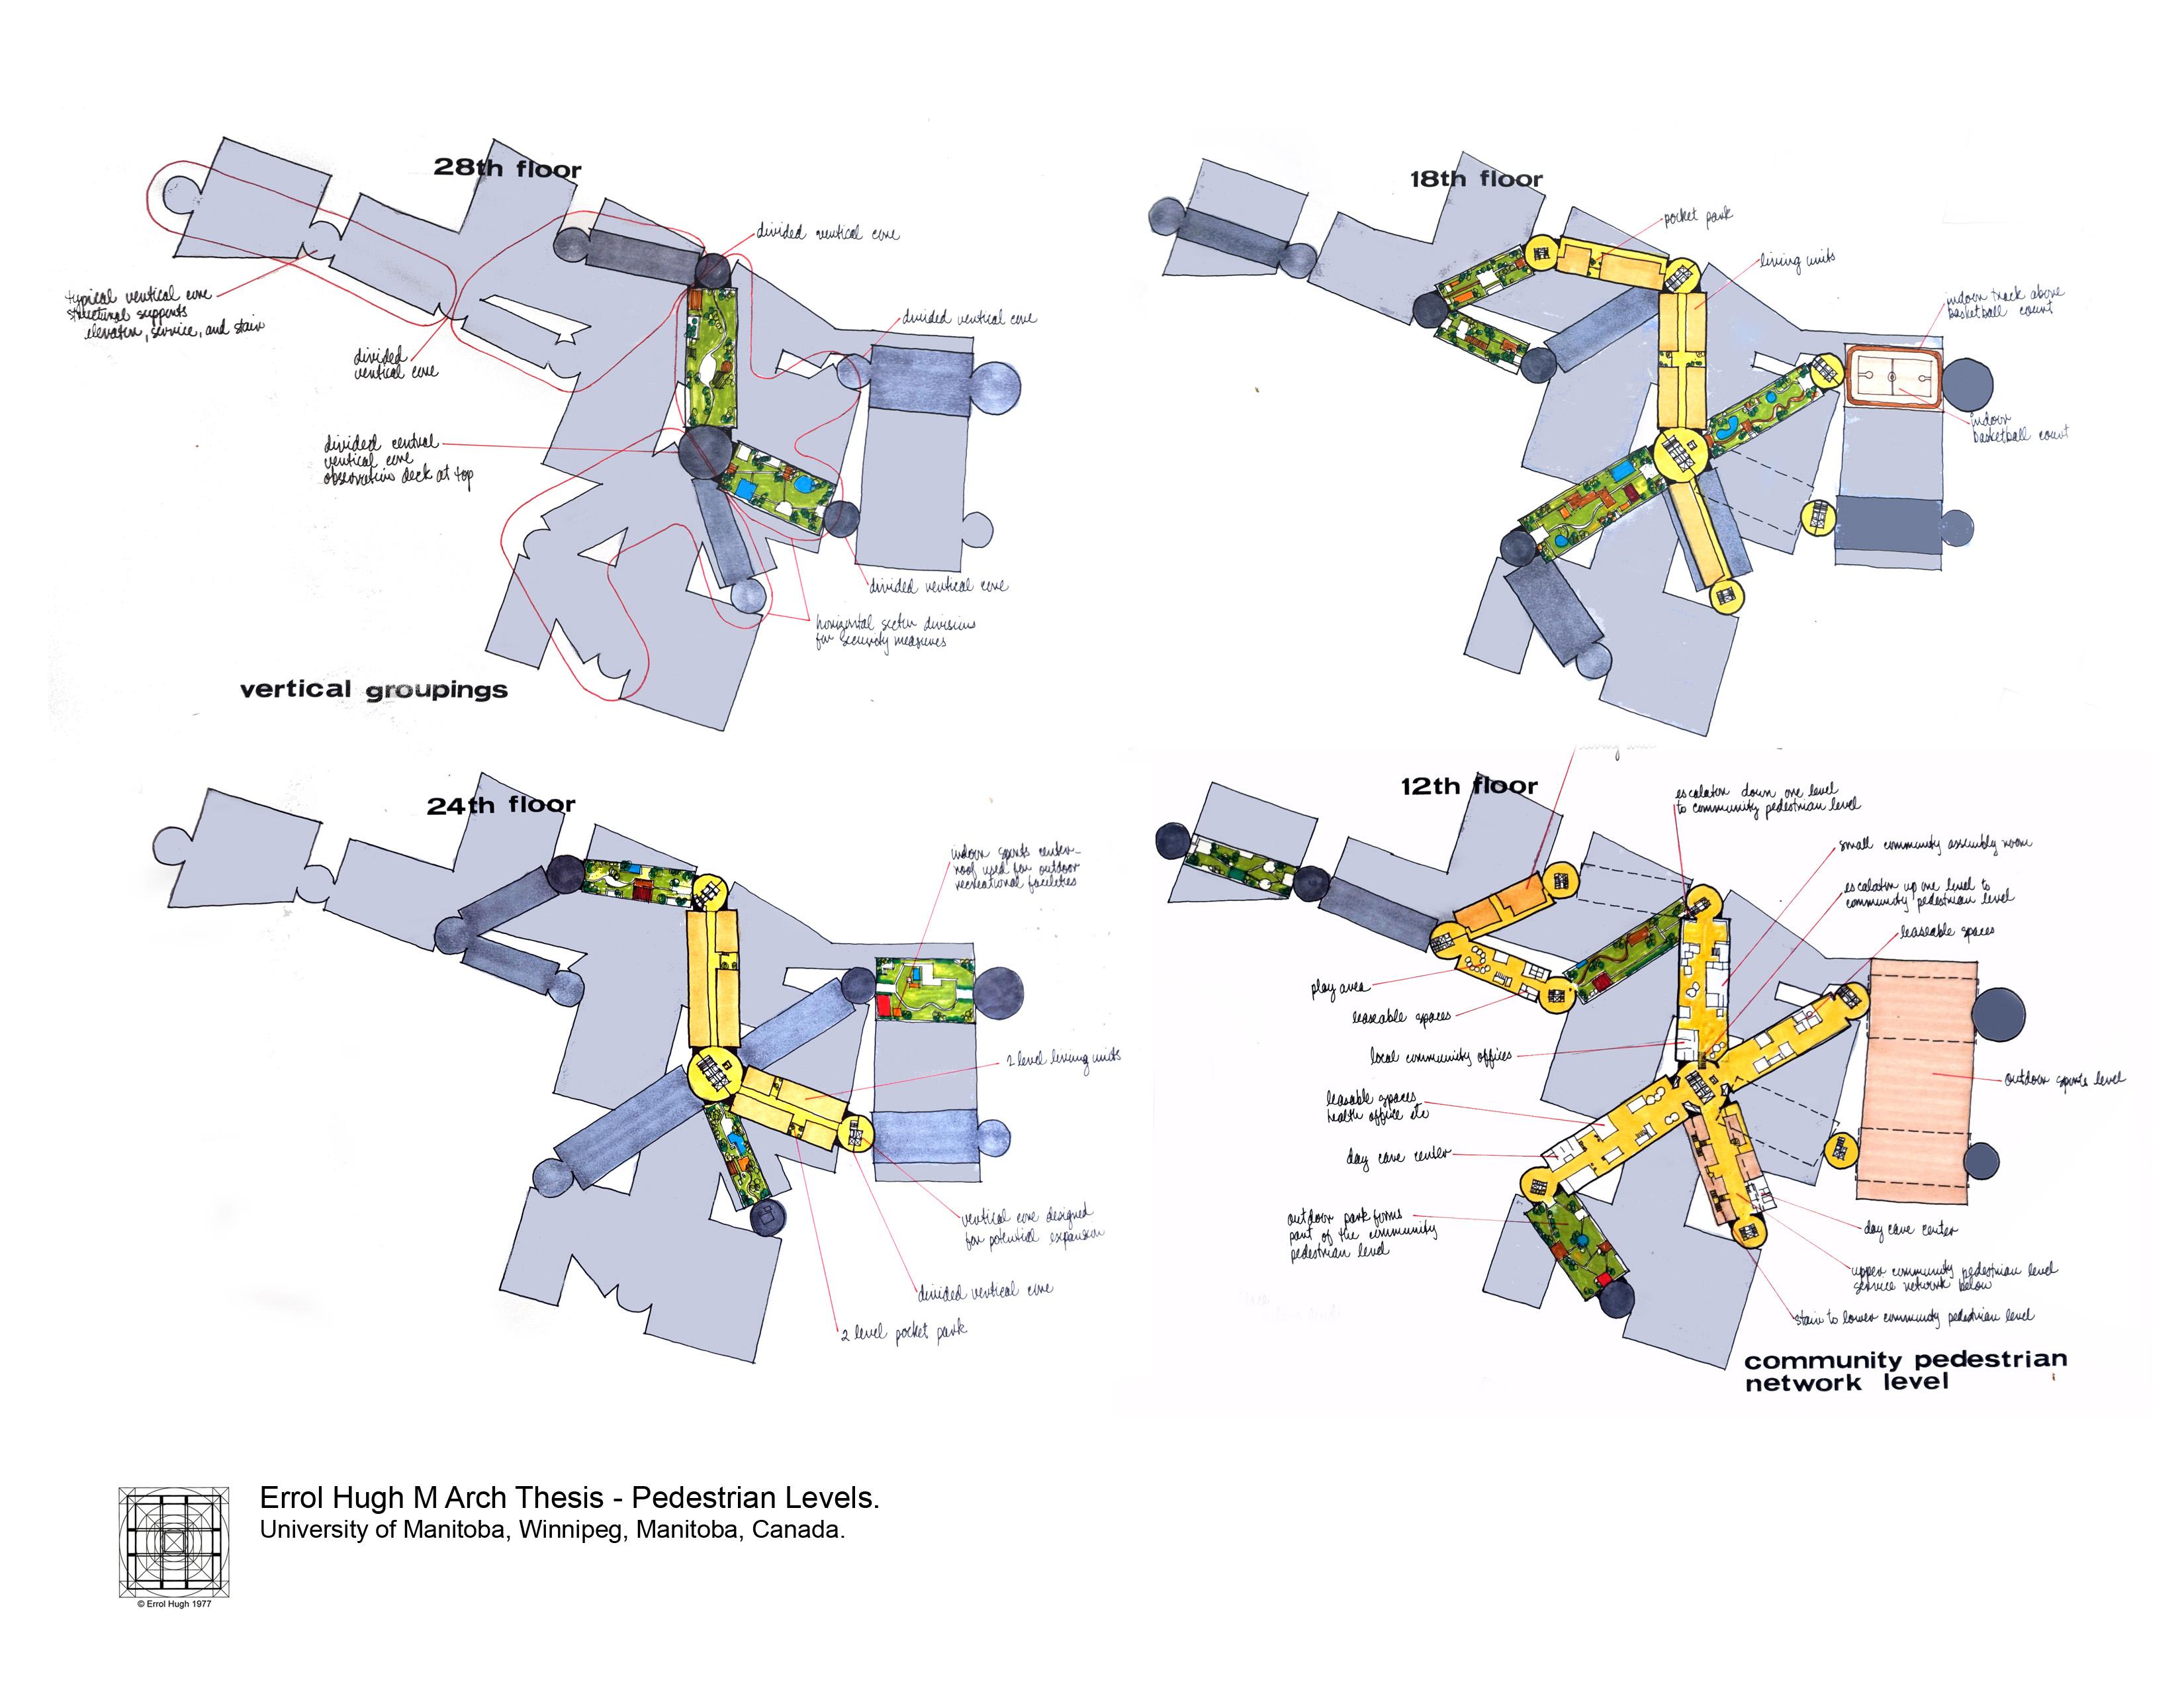 M Arch Thesis - Pedestrian Levels 01.jpg